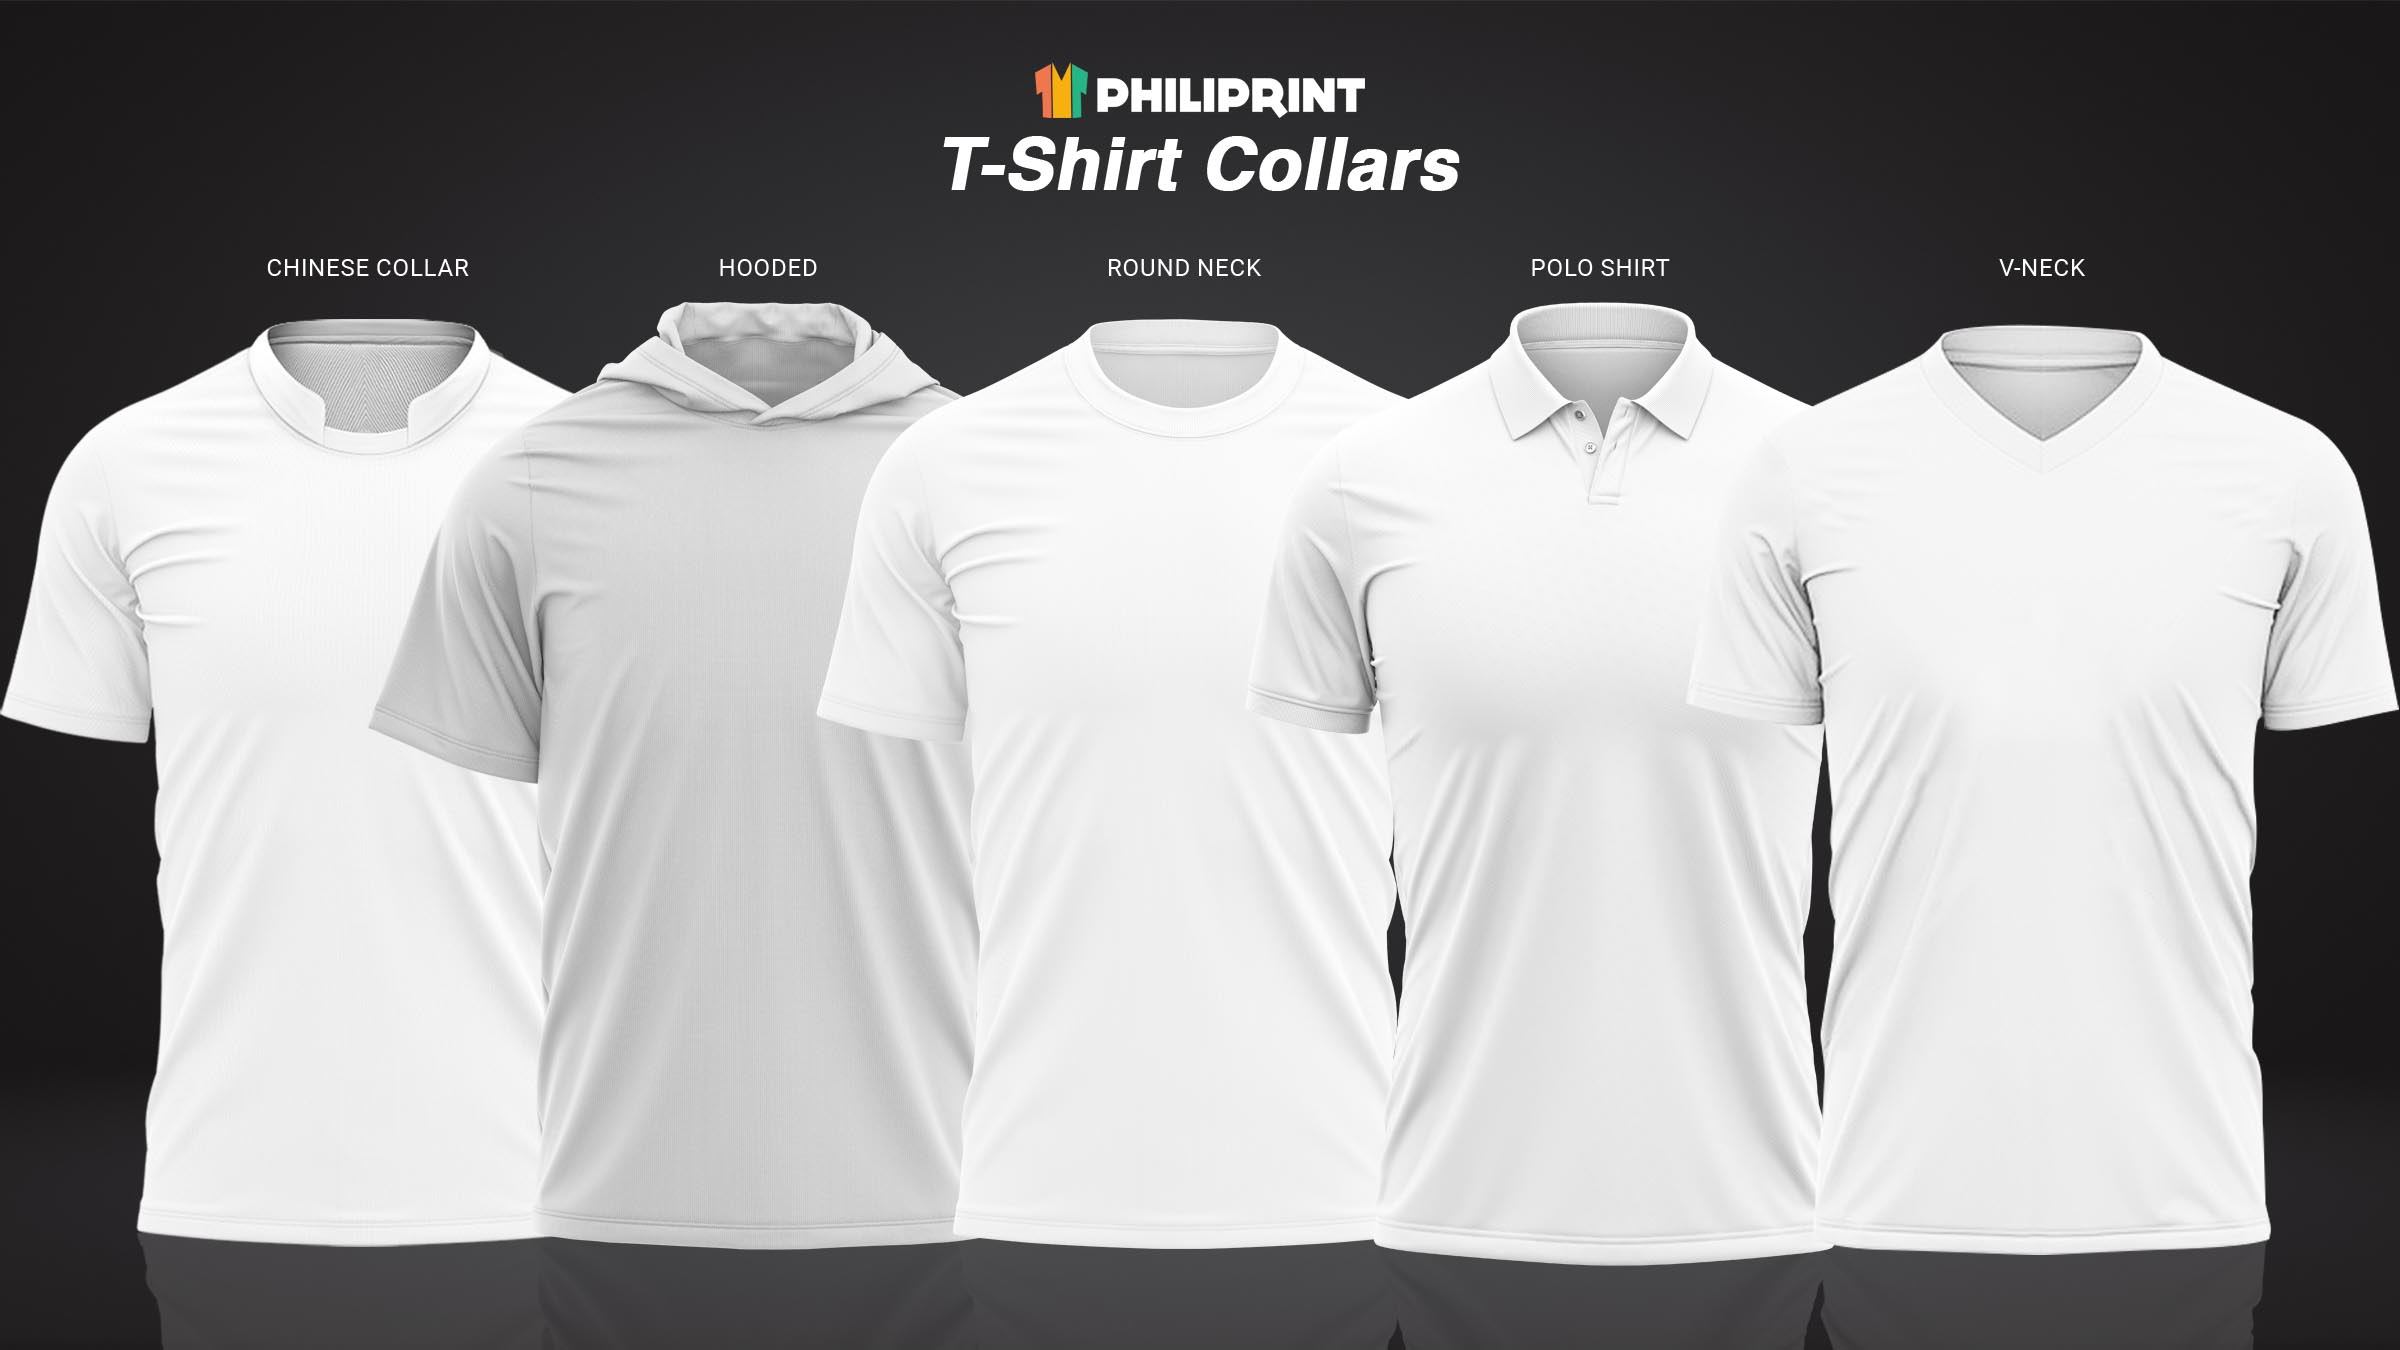 philiprint shirt collars